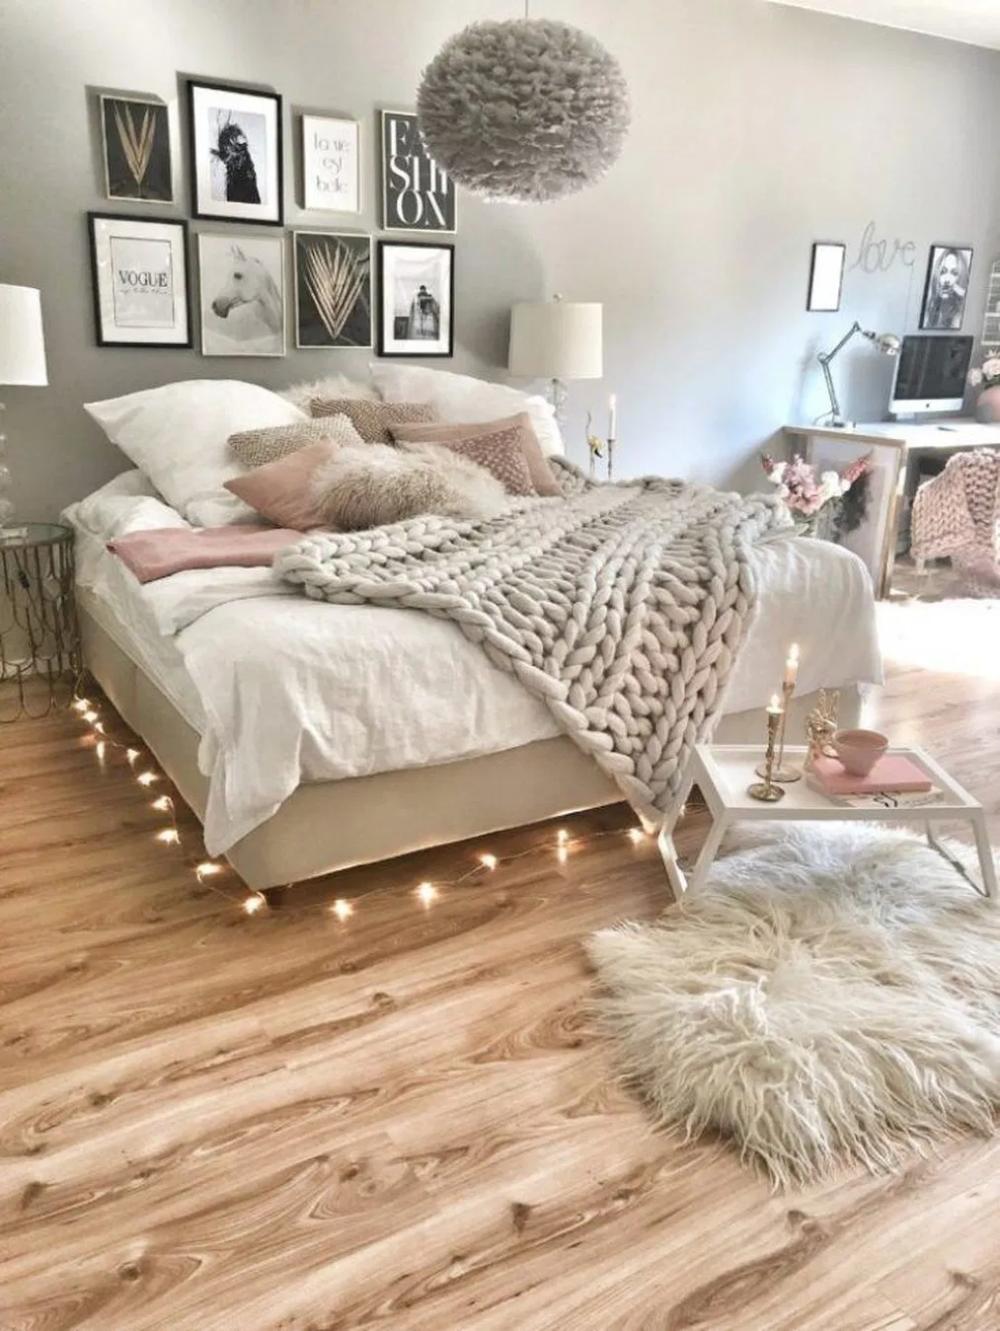 37 Five Elegant Rustic Bedroom Ideas That Will Give Your Rustic Bedroom 15 Bedroom Teenbedroom Room Ideas Bedroom Girl Bedroom Designs Bedroom Inspirations